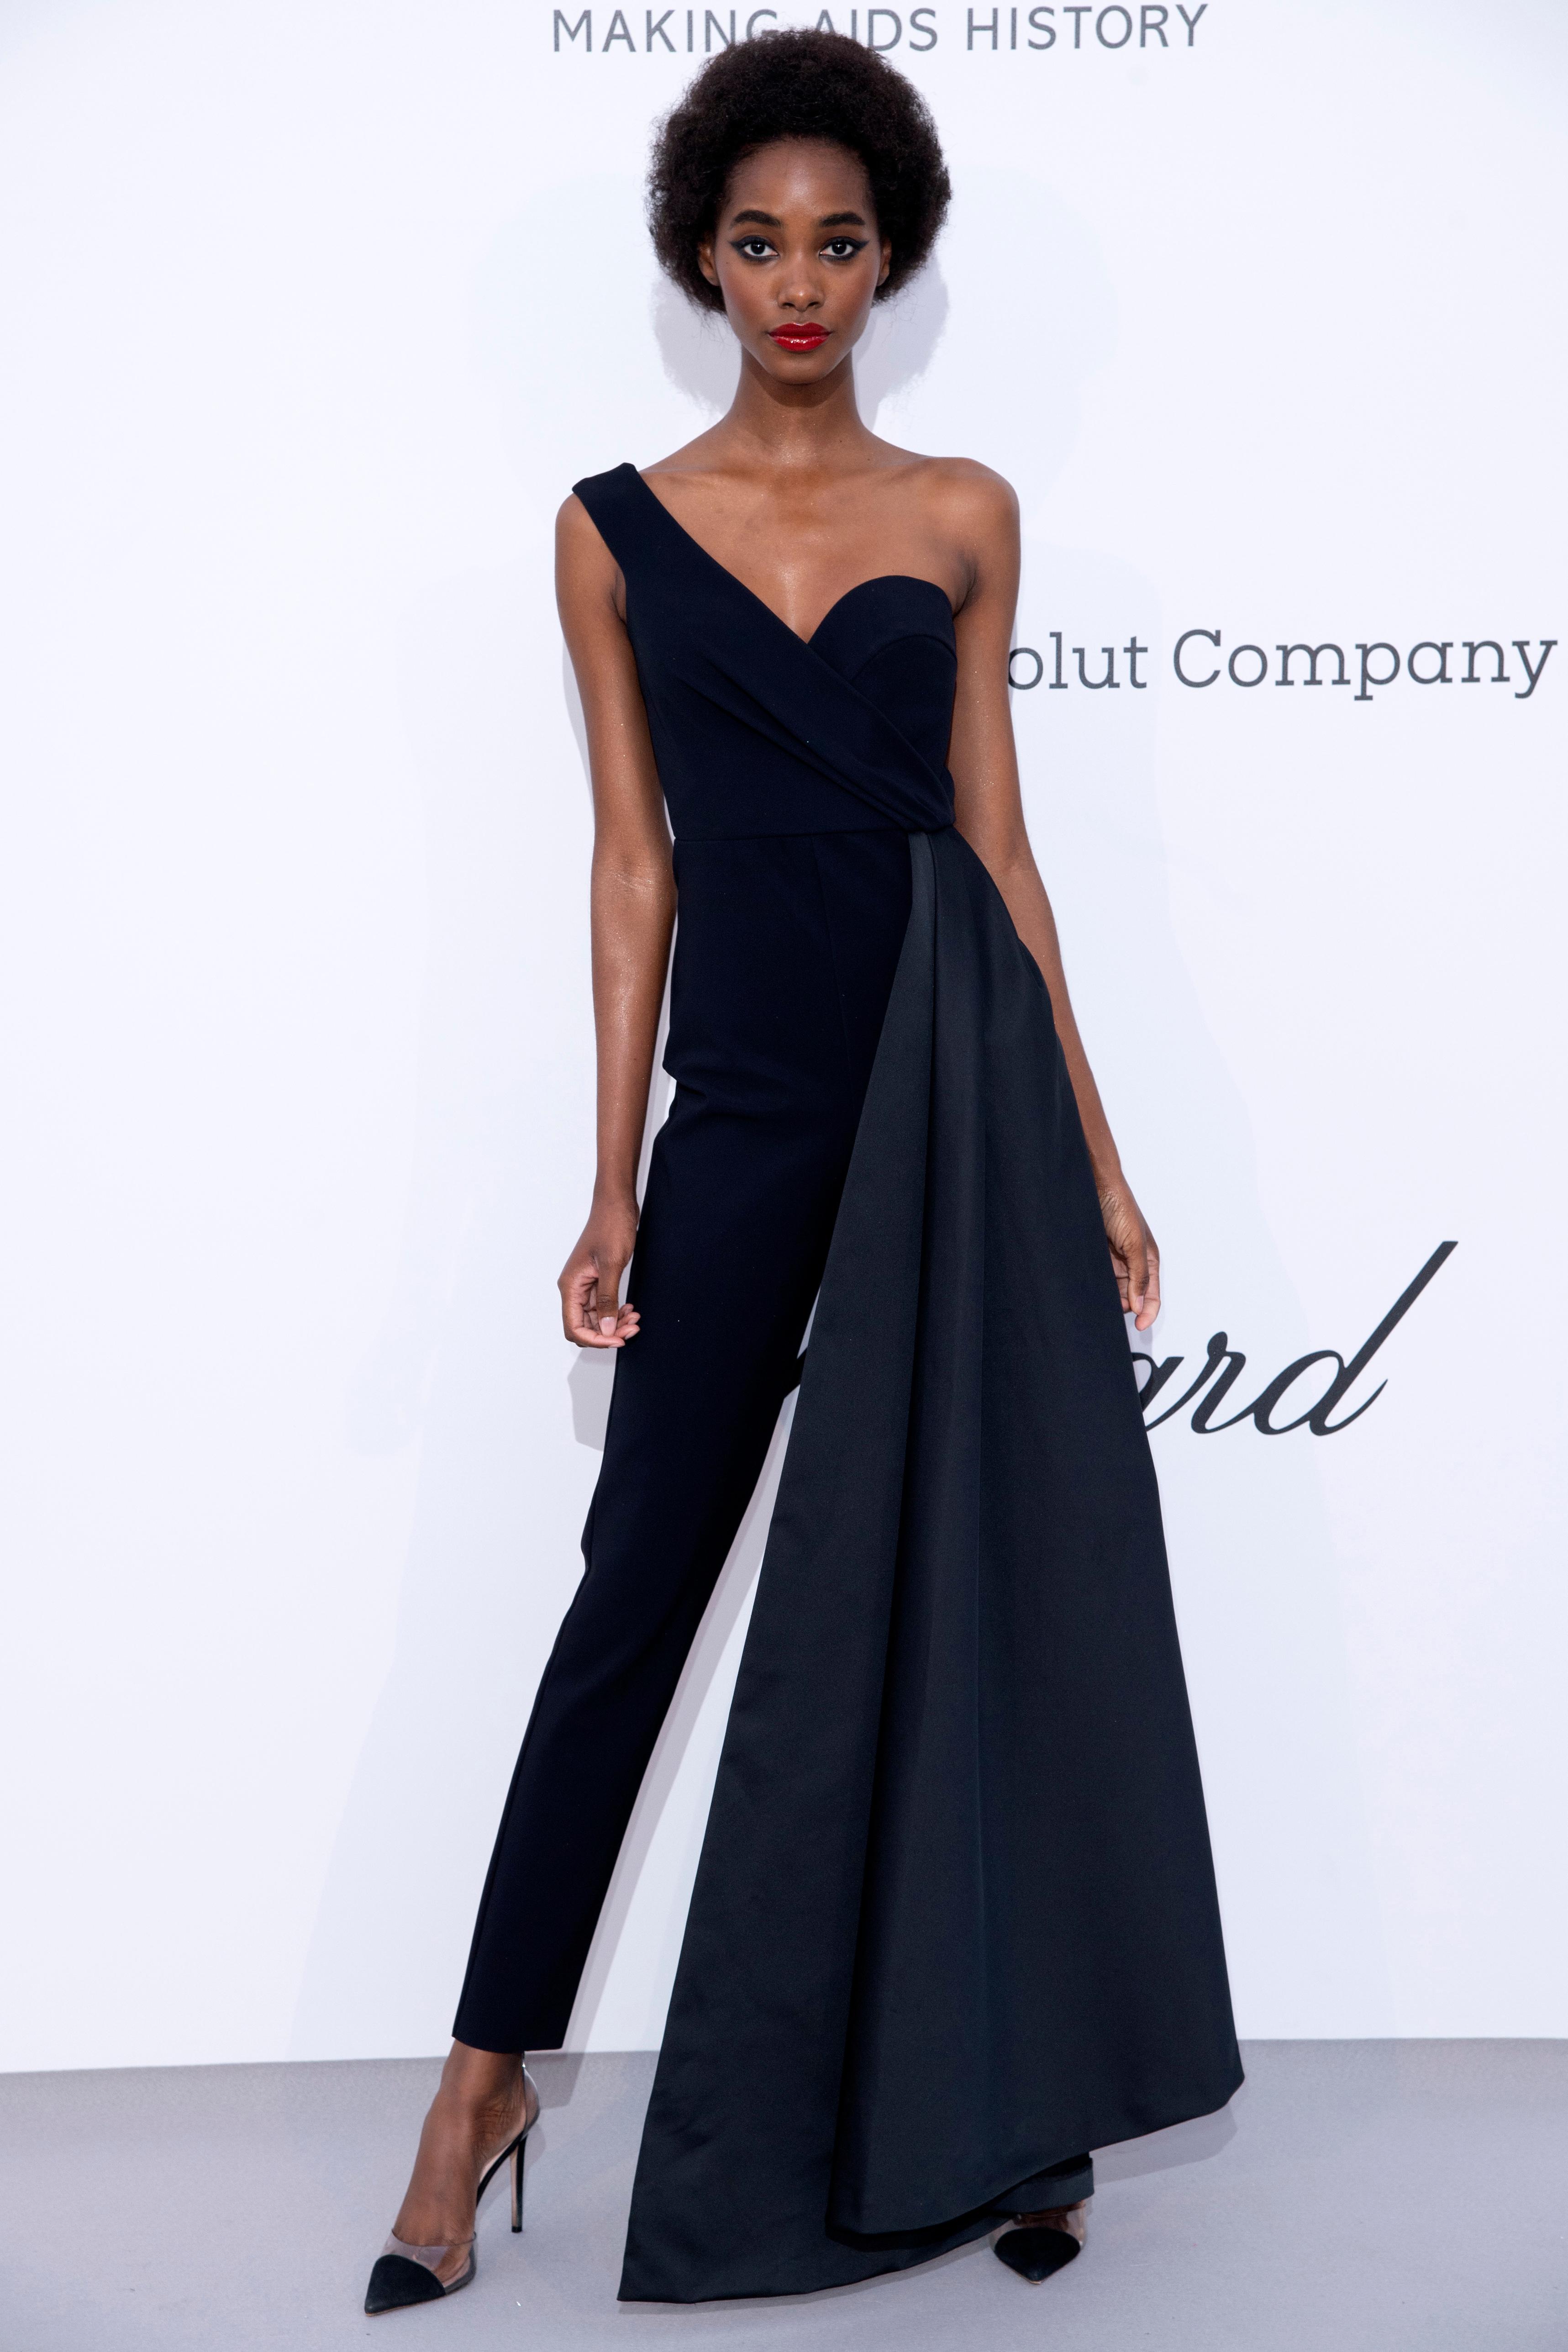 6140ebd280f3 Cannes Film Festival 2019: The Best Dressed   PORTER